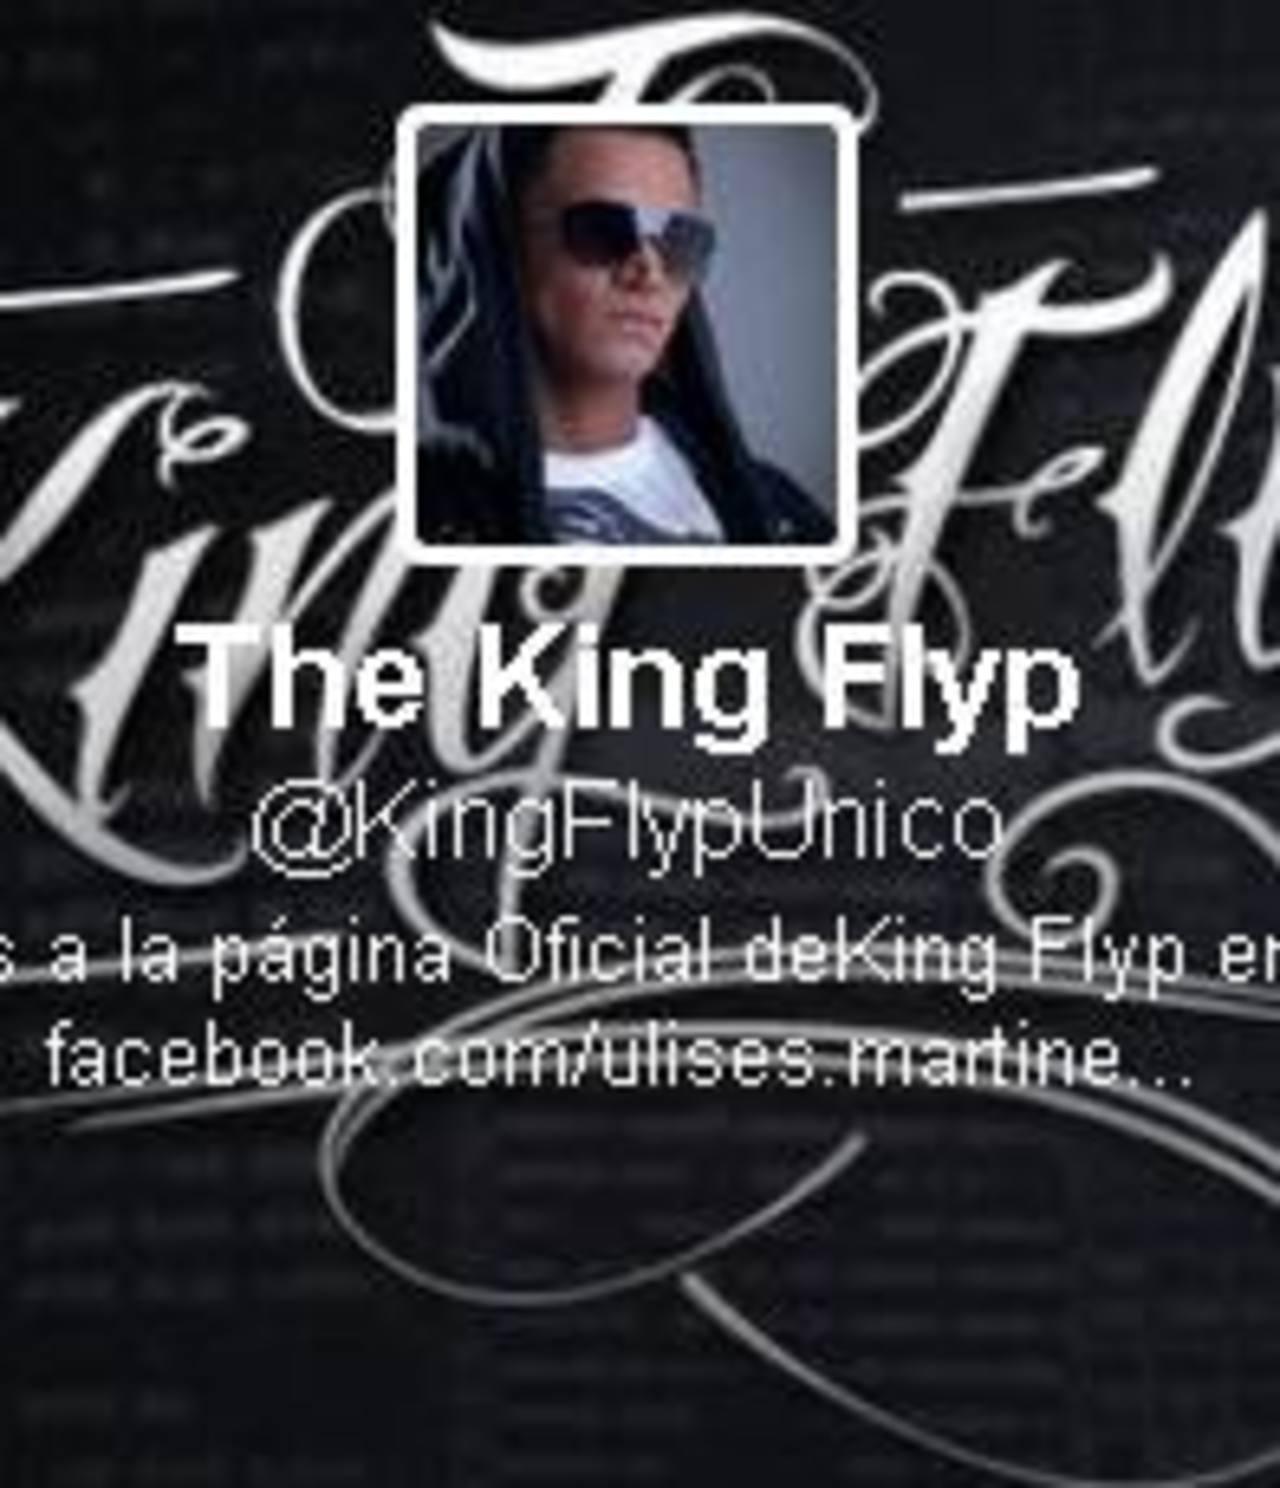 The King Flyp se suma a Twitter